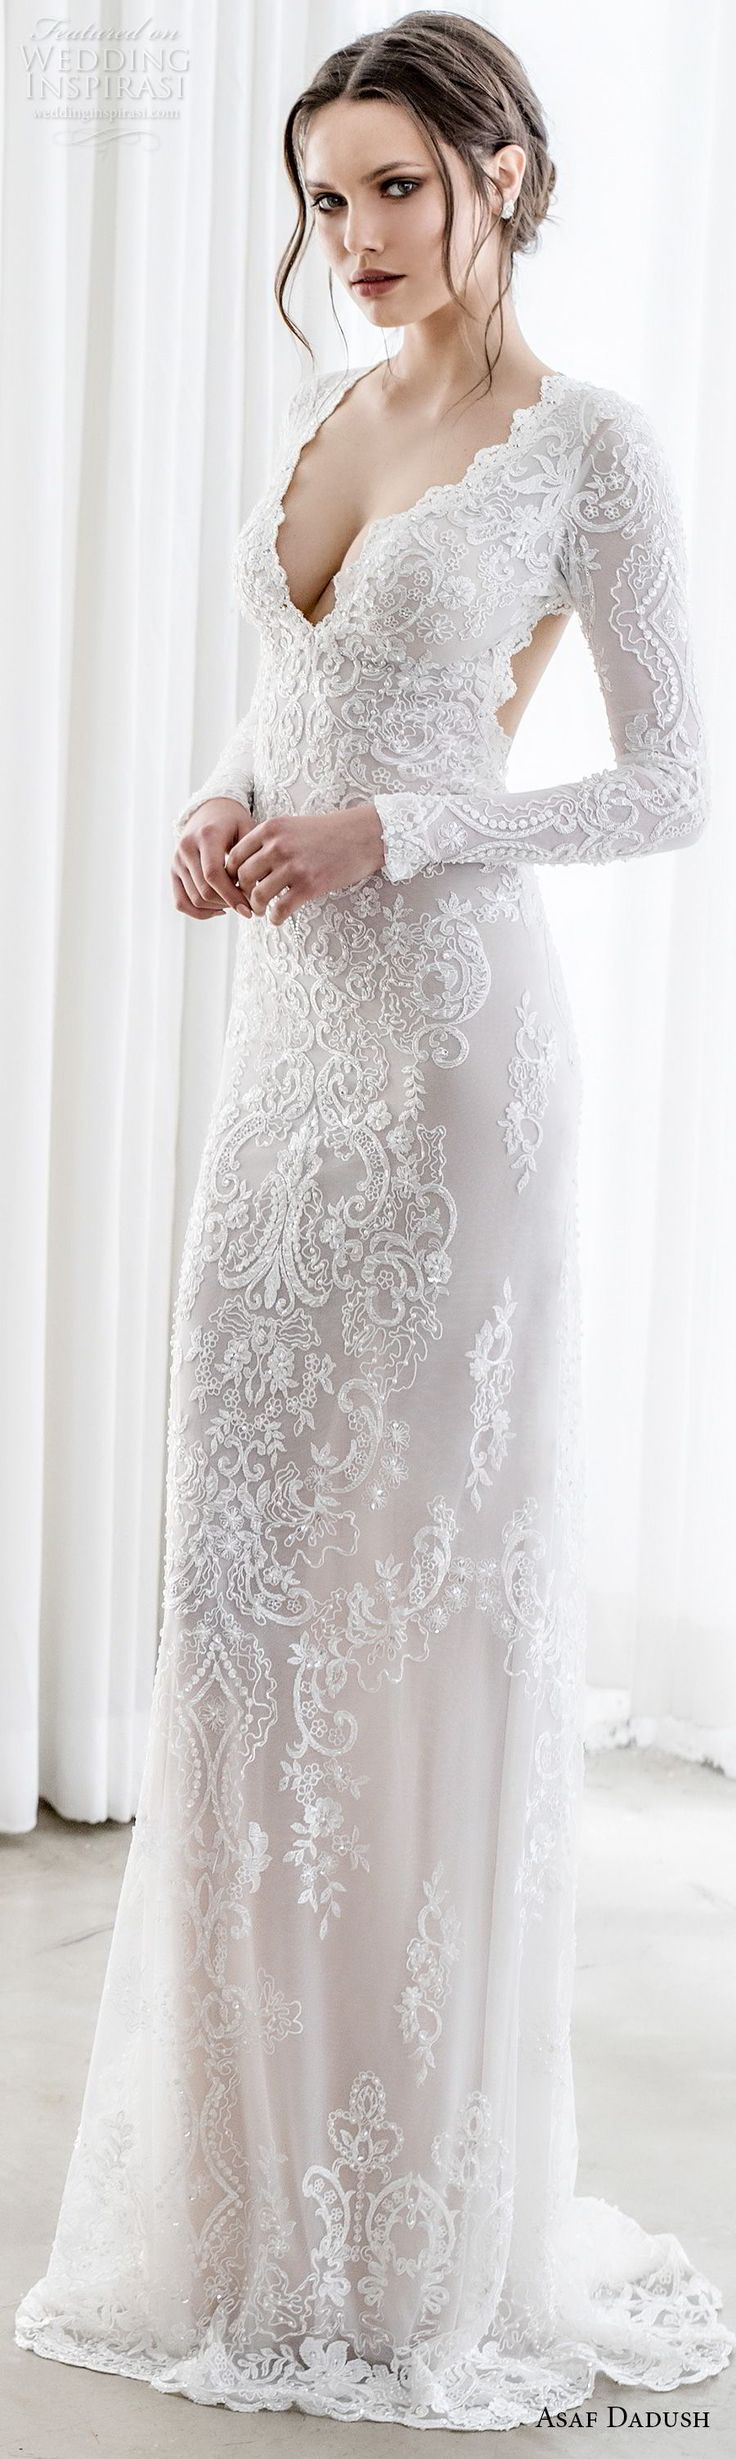 asaf dadush 2017 bridal long sleeves deep v sweetheart neckline full embellishment sexy elegant sheath wedding dress keyhole back sweep train (06) lv -- Asaf Dadush 2017 Wedding Dresses